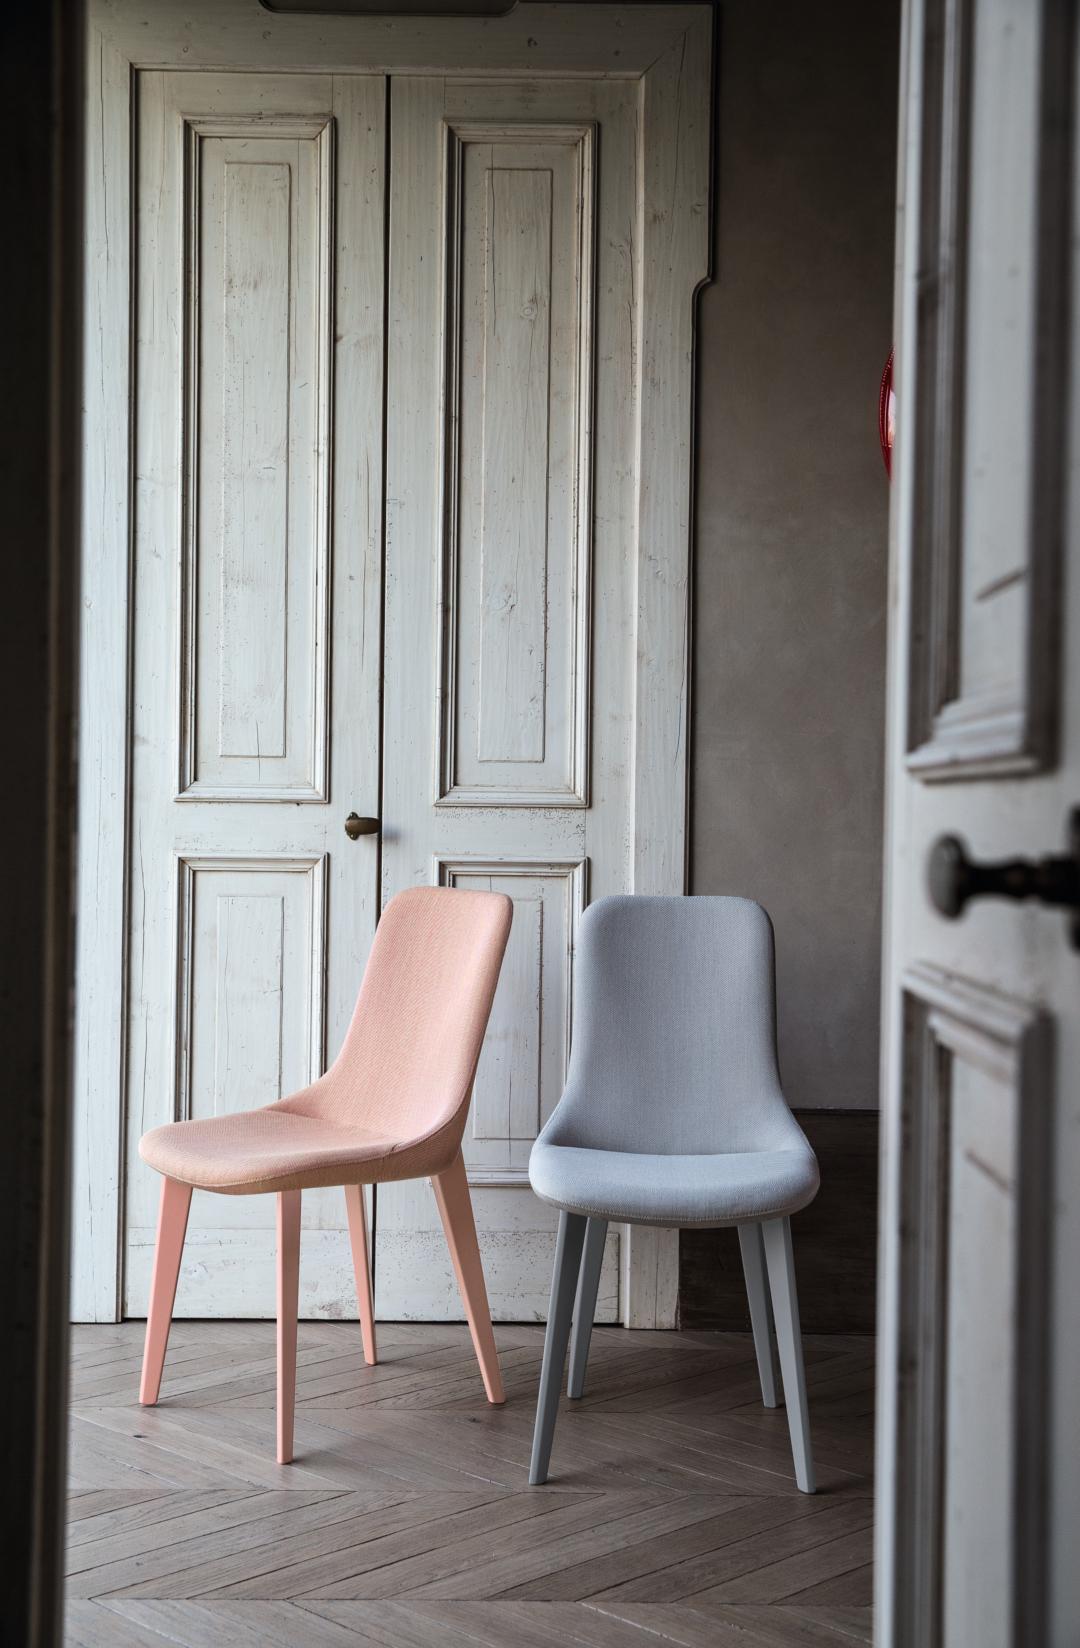 Duo de chaises Ascot rose et bleu Bross